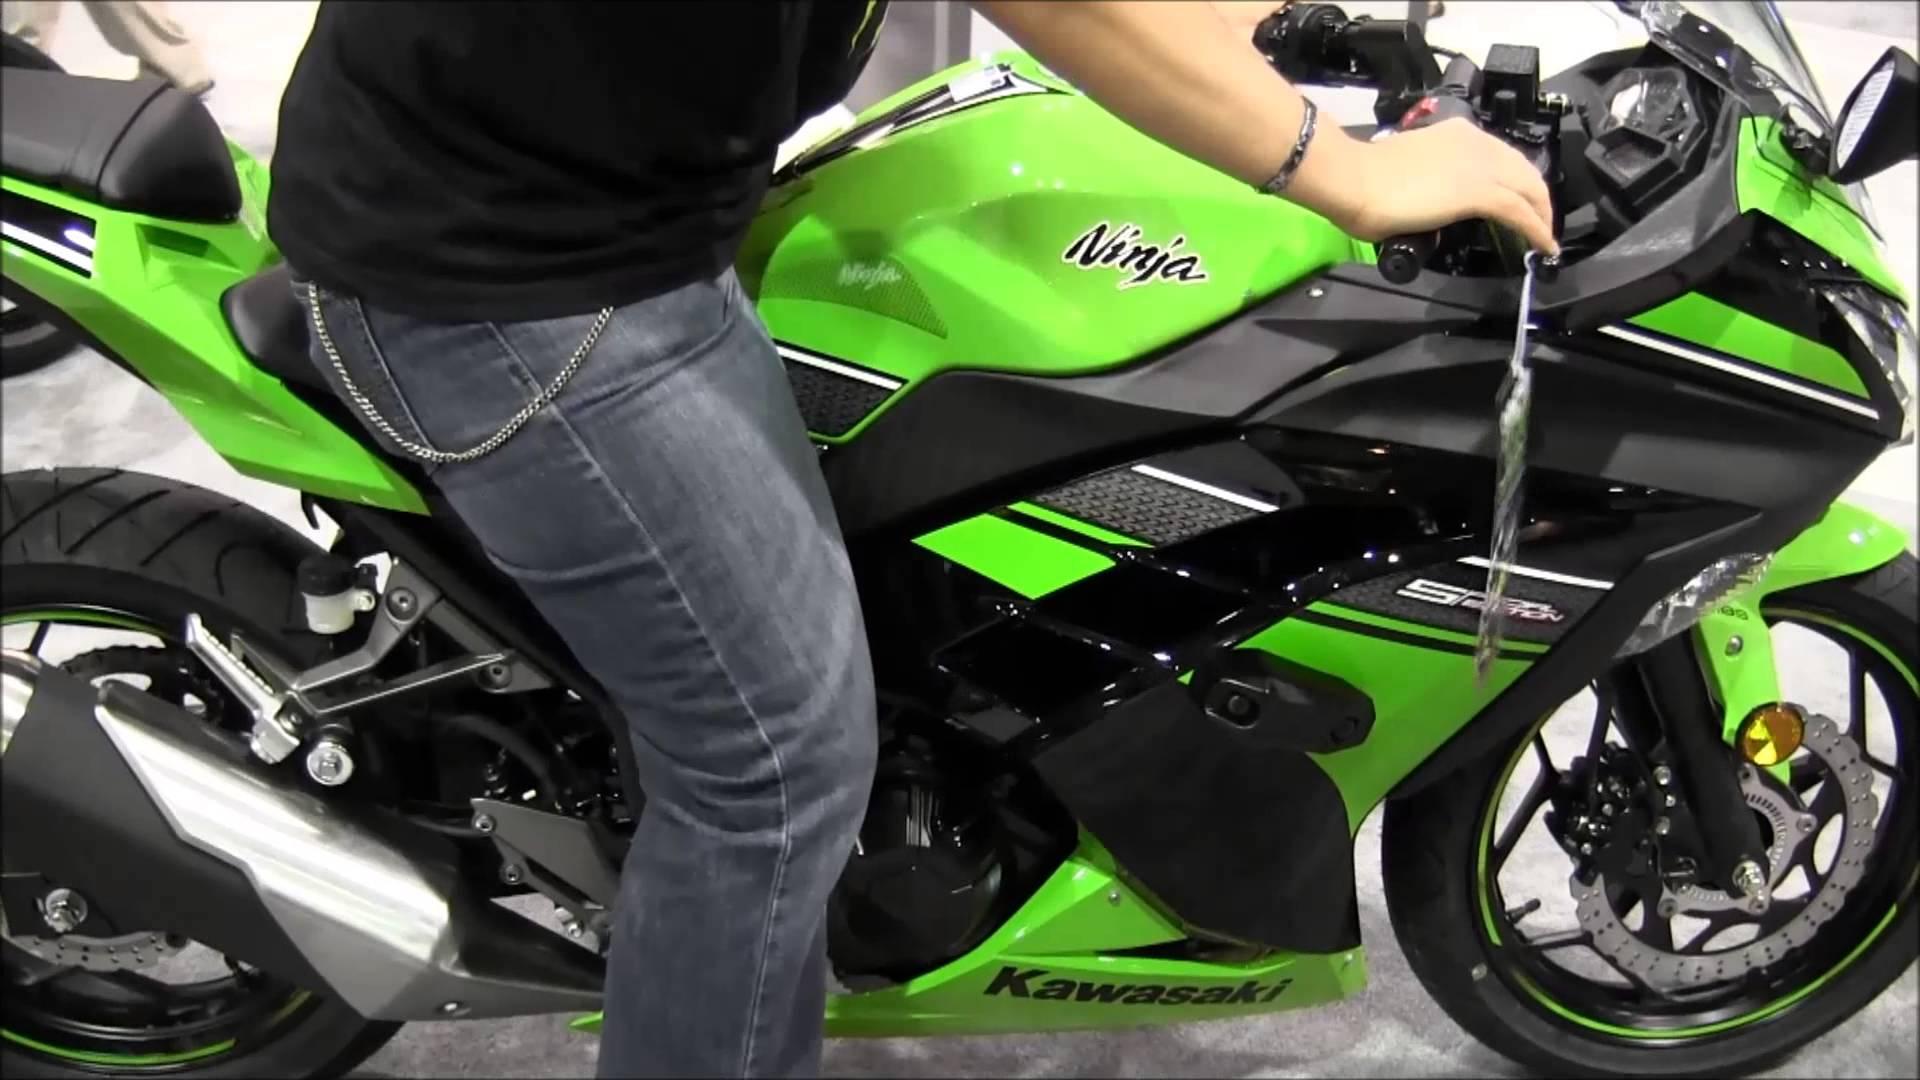 Kawasaki Ninja 300 Special Edition 2017